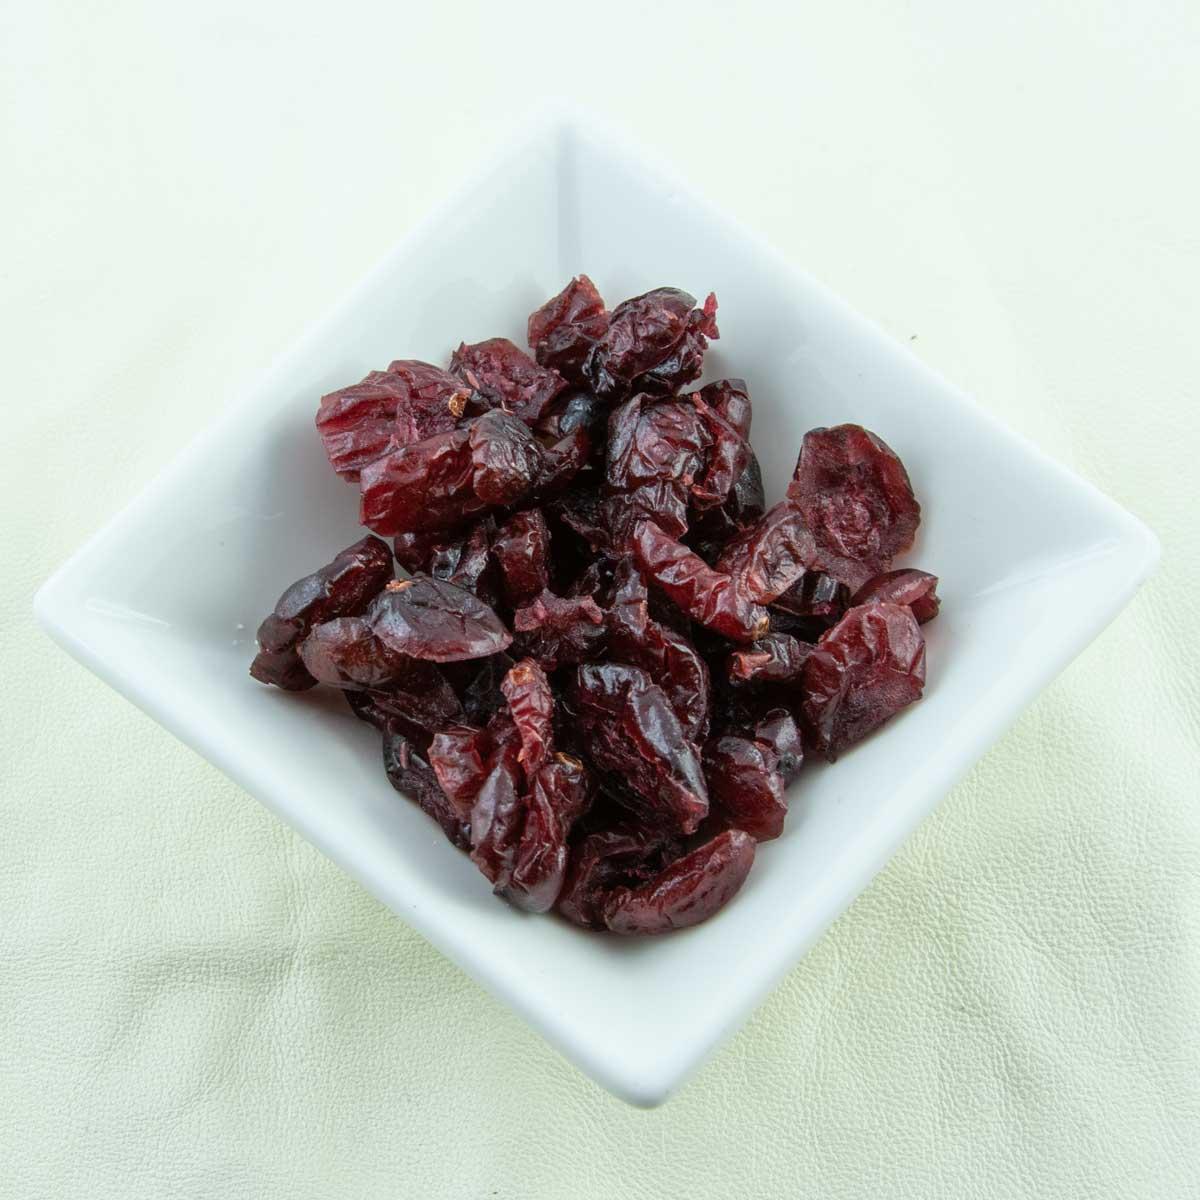 Cranberrys in Ananasdicksaft 200g